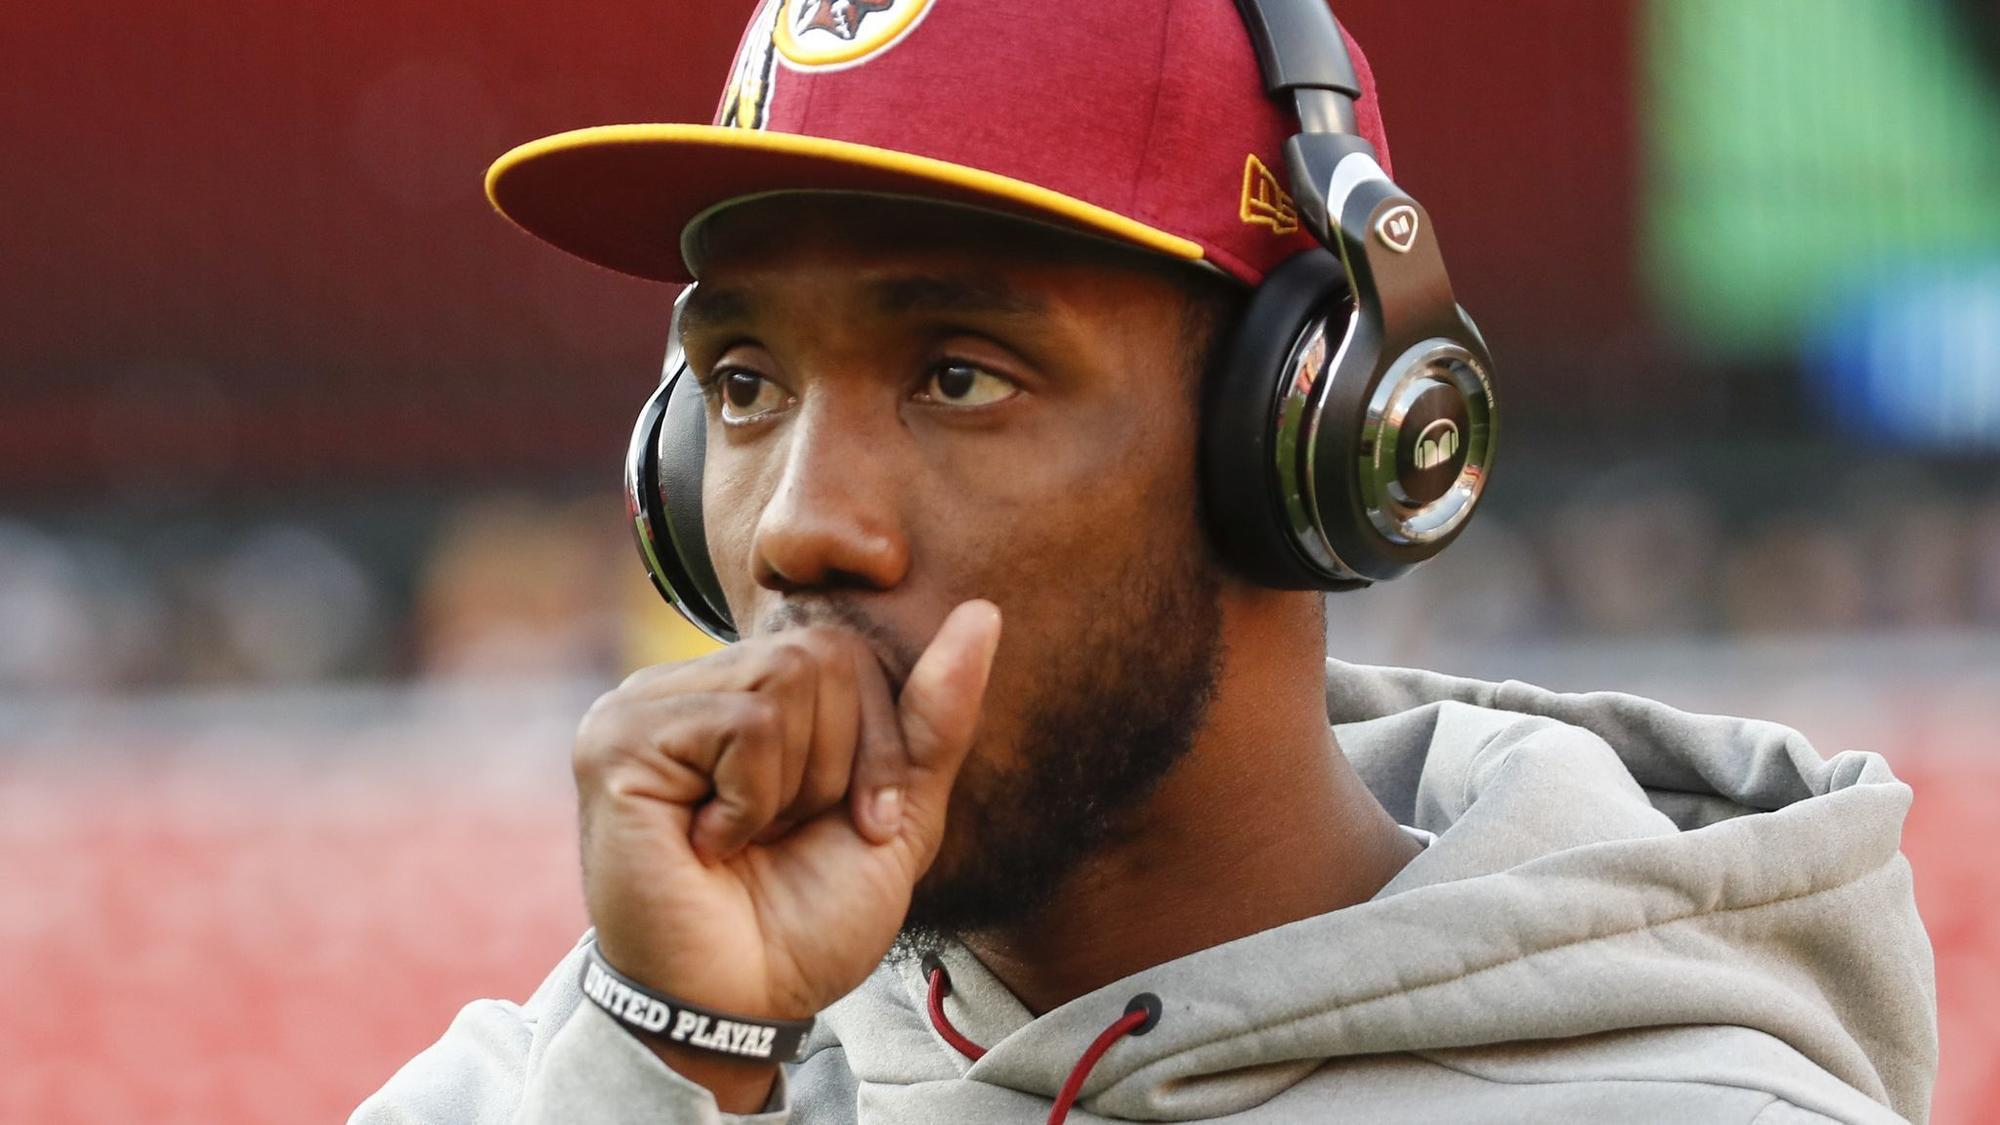 Nfl Quarterback Johnson Still On San Diego Fleet S Radar